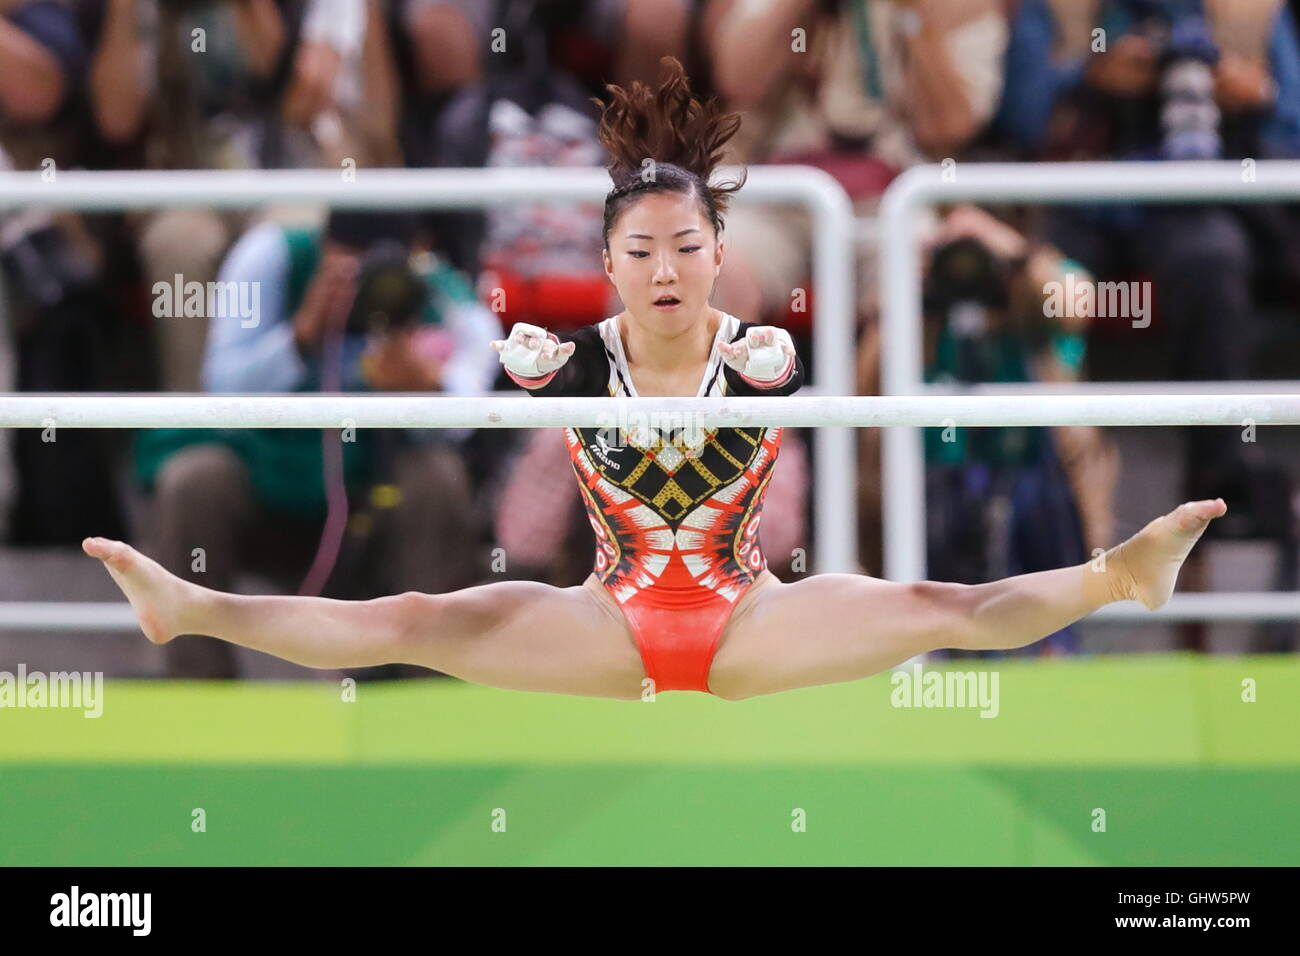 Rio de Janeiro, Brazil. 11th Aug, 2016. Asuka Teramoto (JPN) Artistic Gymnastics : Women's Individual All-Around - Stock Image